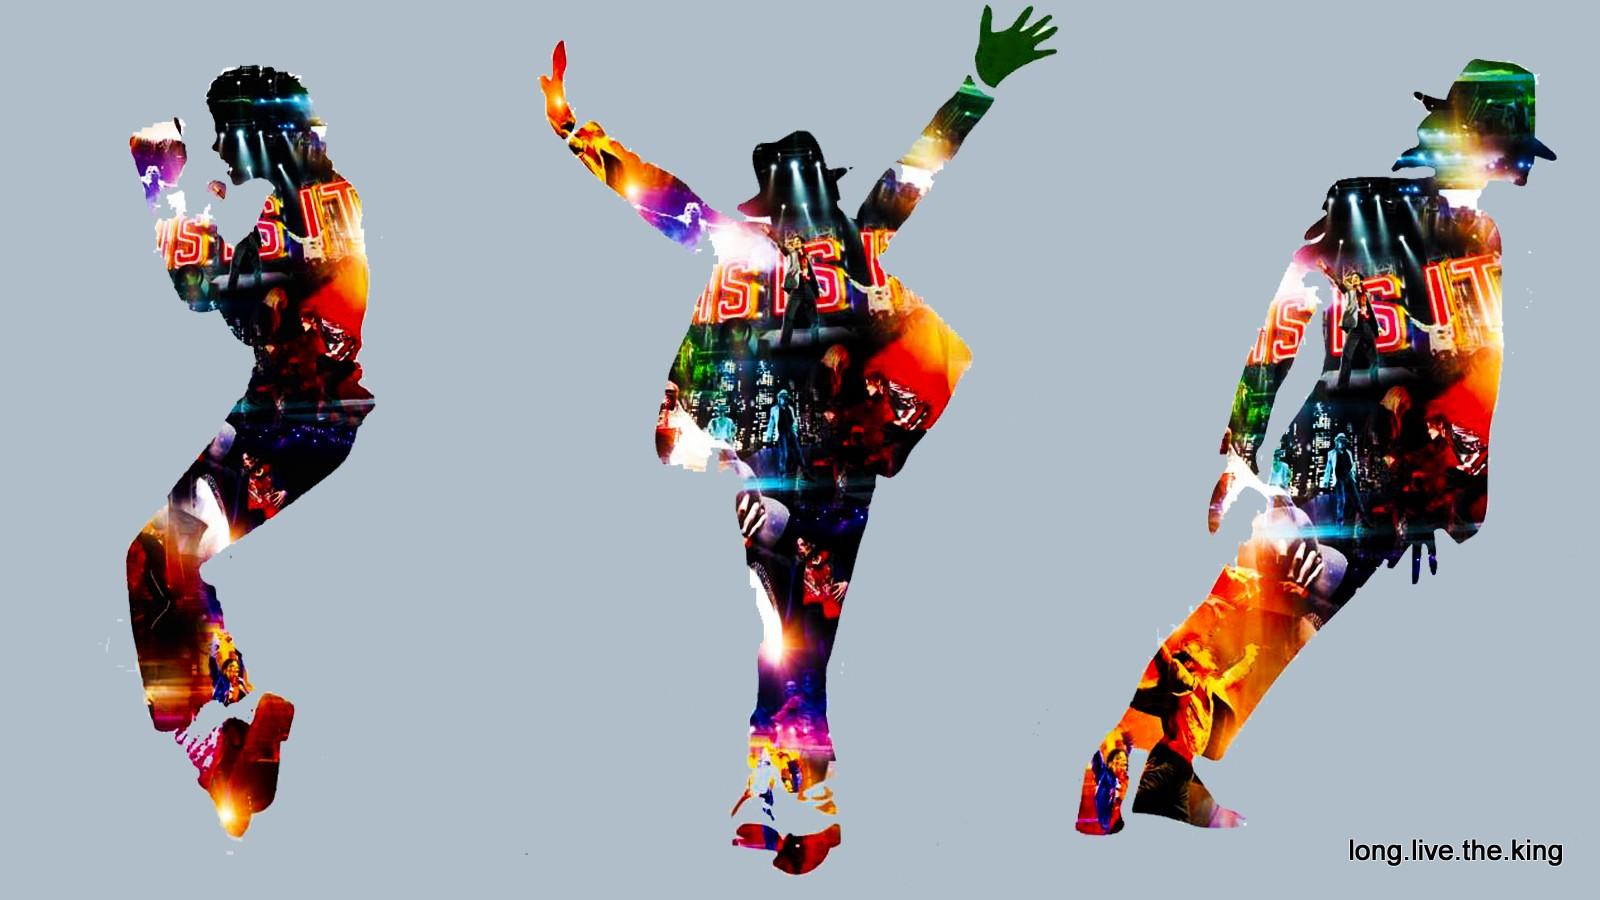 Mj 3d Name Wallpaper Michael Jackson Wallpapers Hd A21 Hd Desktop Wallpapers